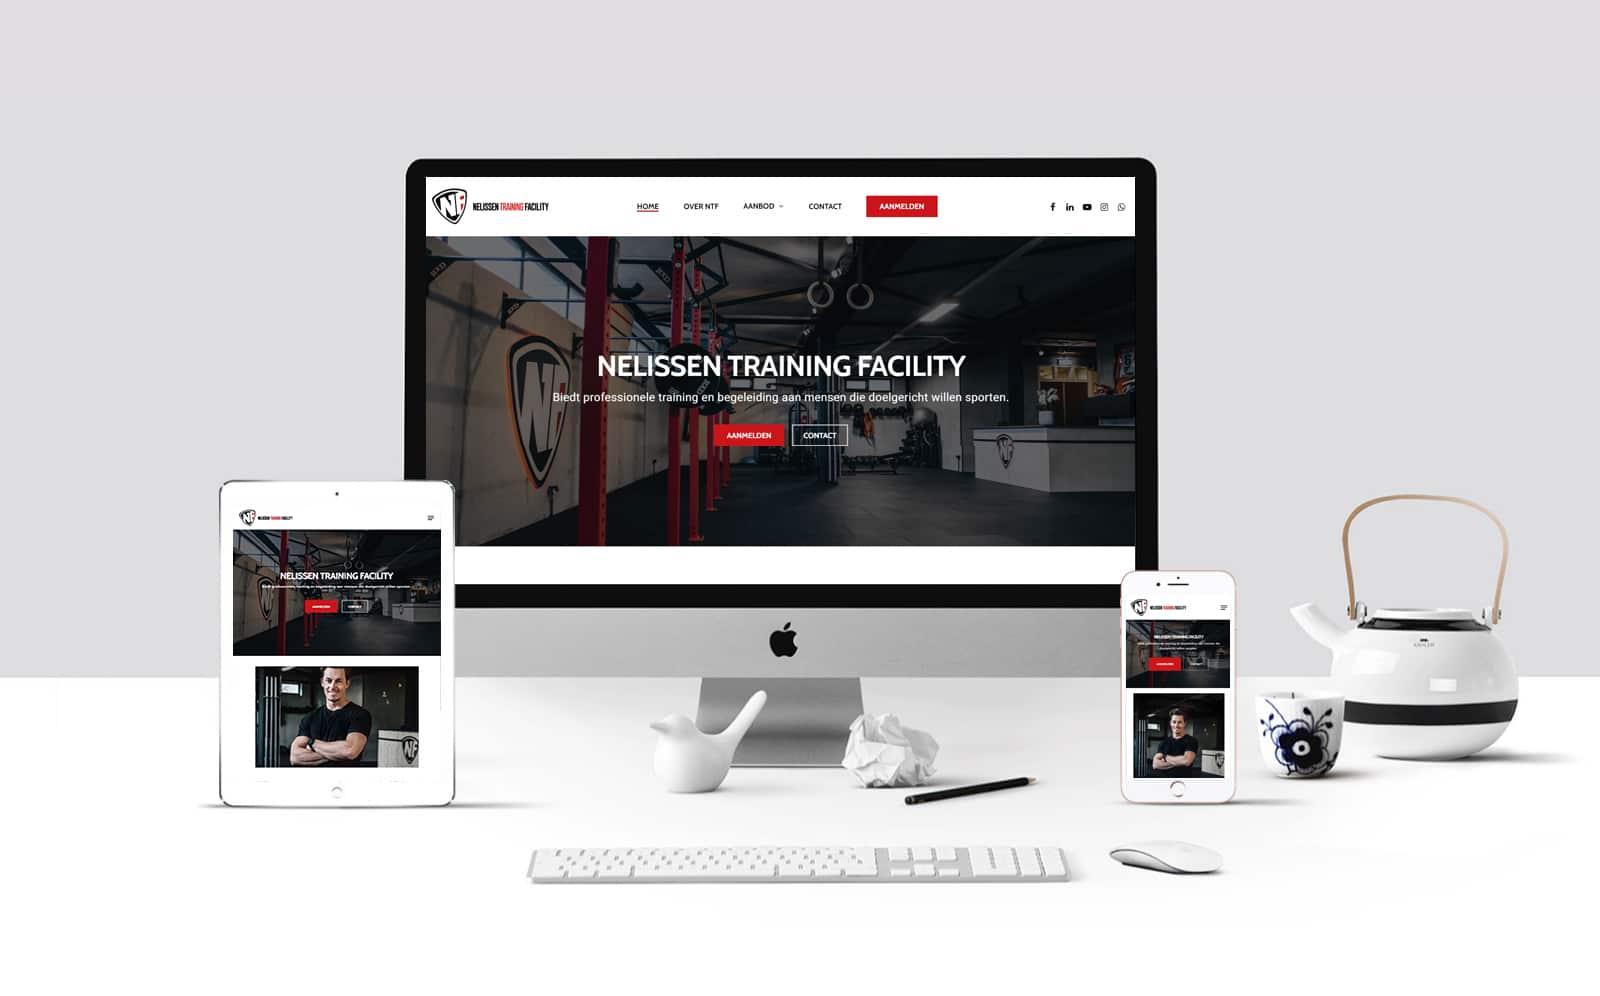 Nelissen Training Facility – februari 2020